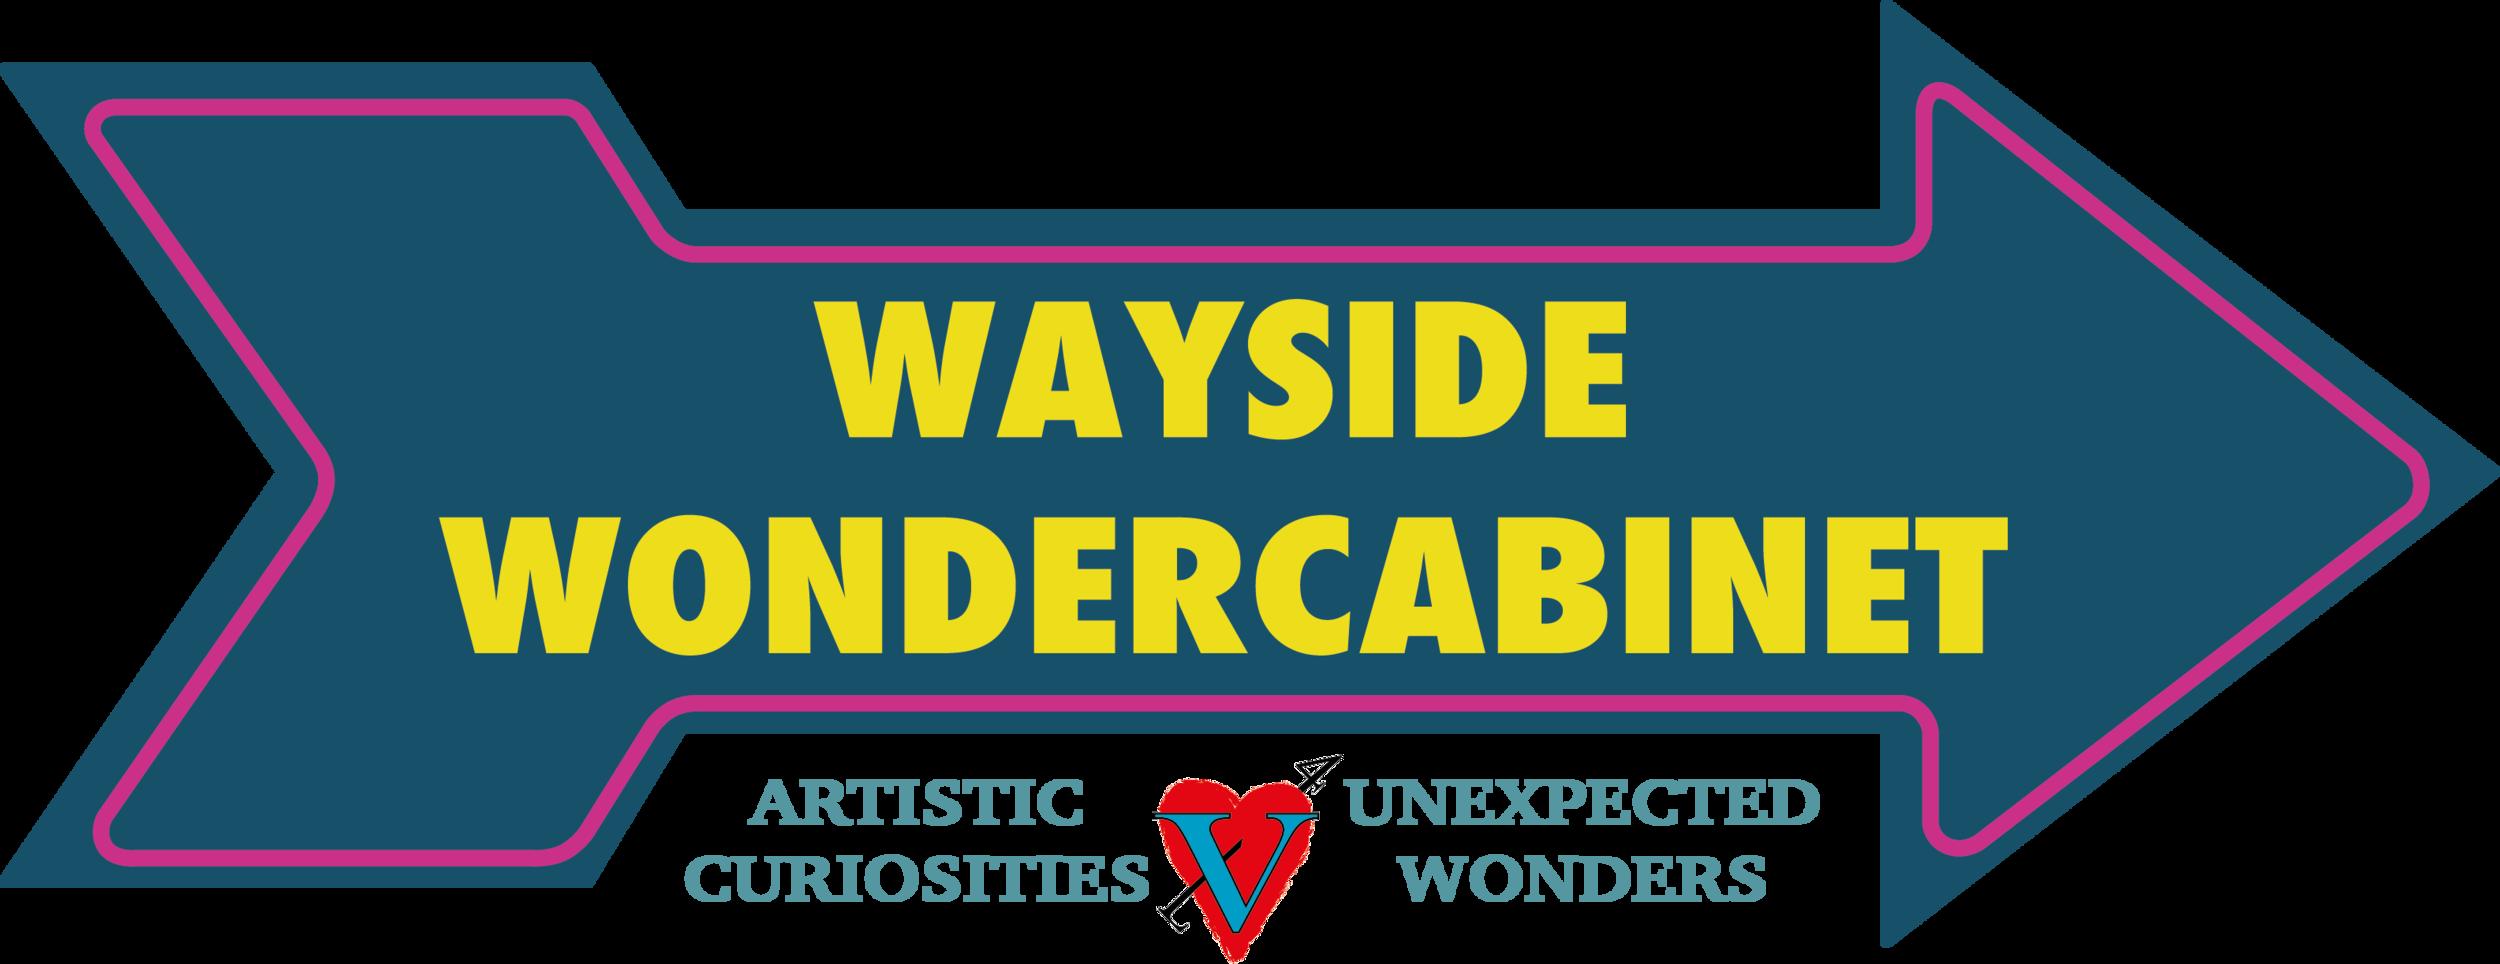 wayside_wondercabinet.png